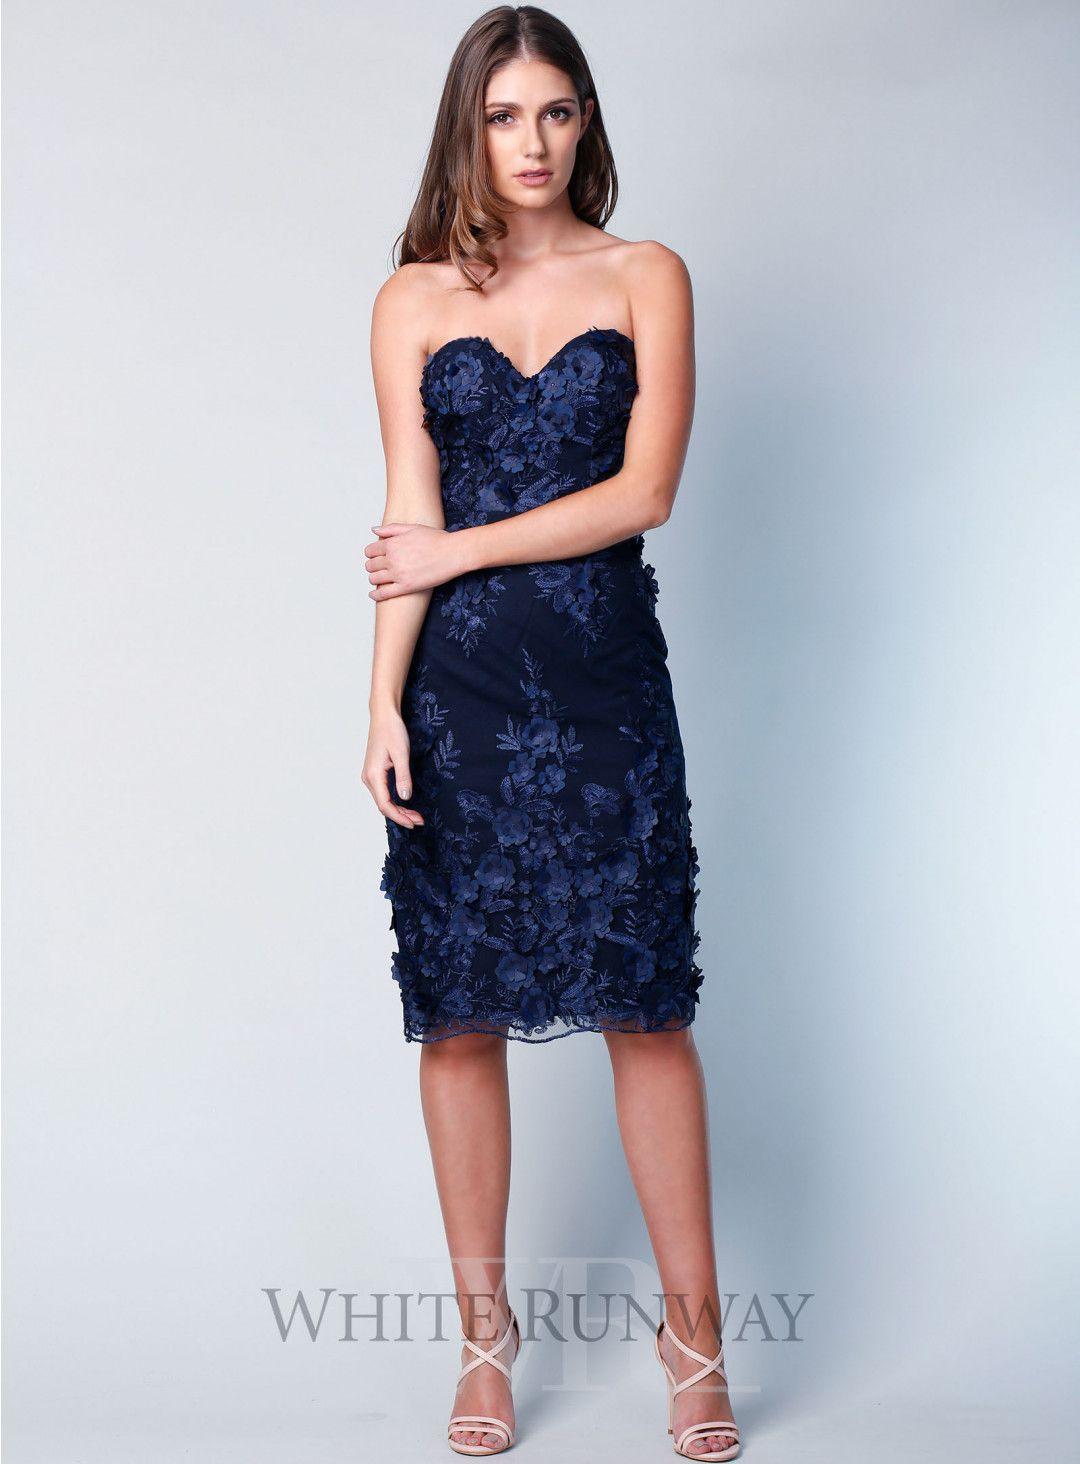 Rosetta Lace Strapless Midi A Beautiful Midi Dress By Grace Hart Features A Sweetheart Neckline Delicate Floral Lace Dress Beautiful Midi Dresses Dresses [ 1464 x 1080 Pixel ]